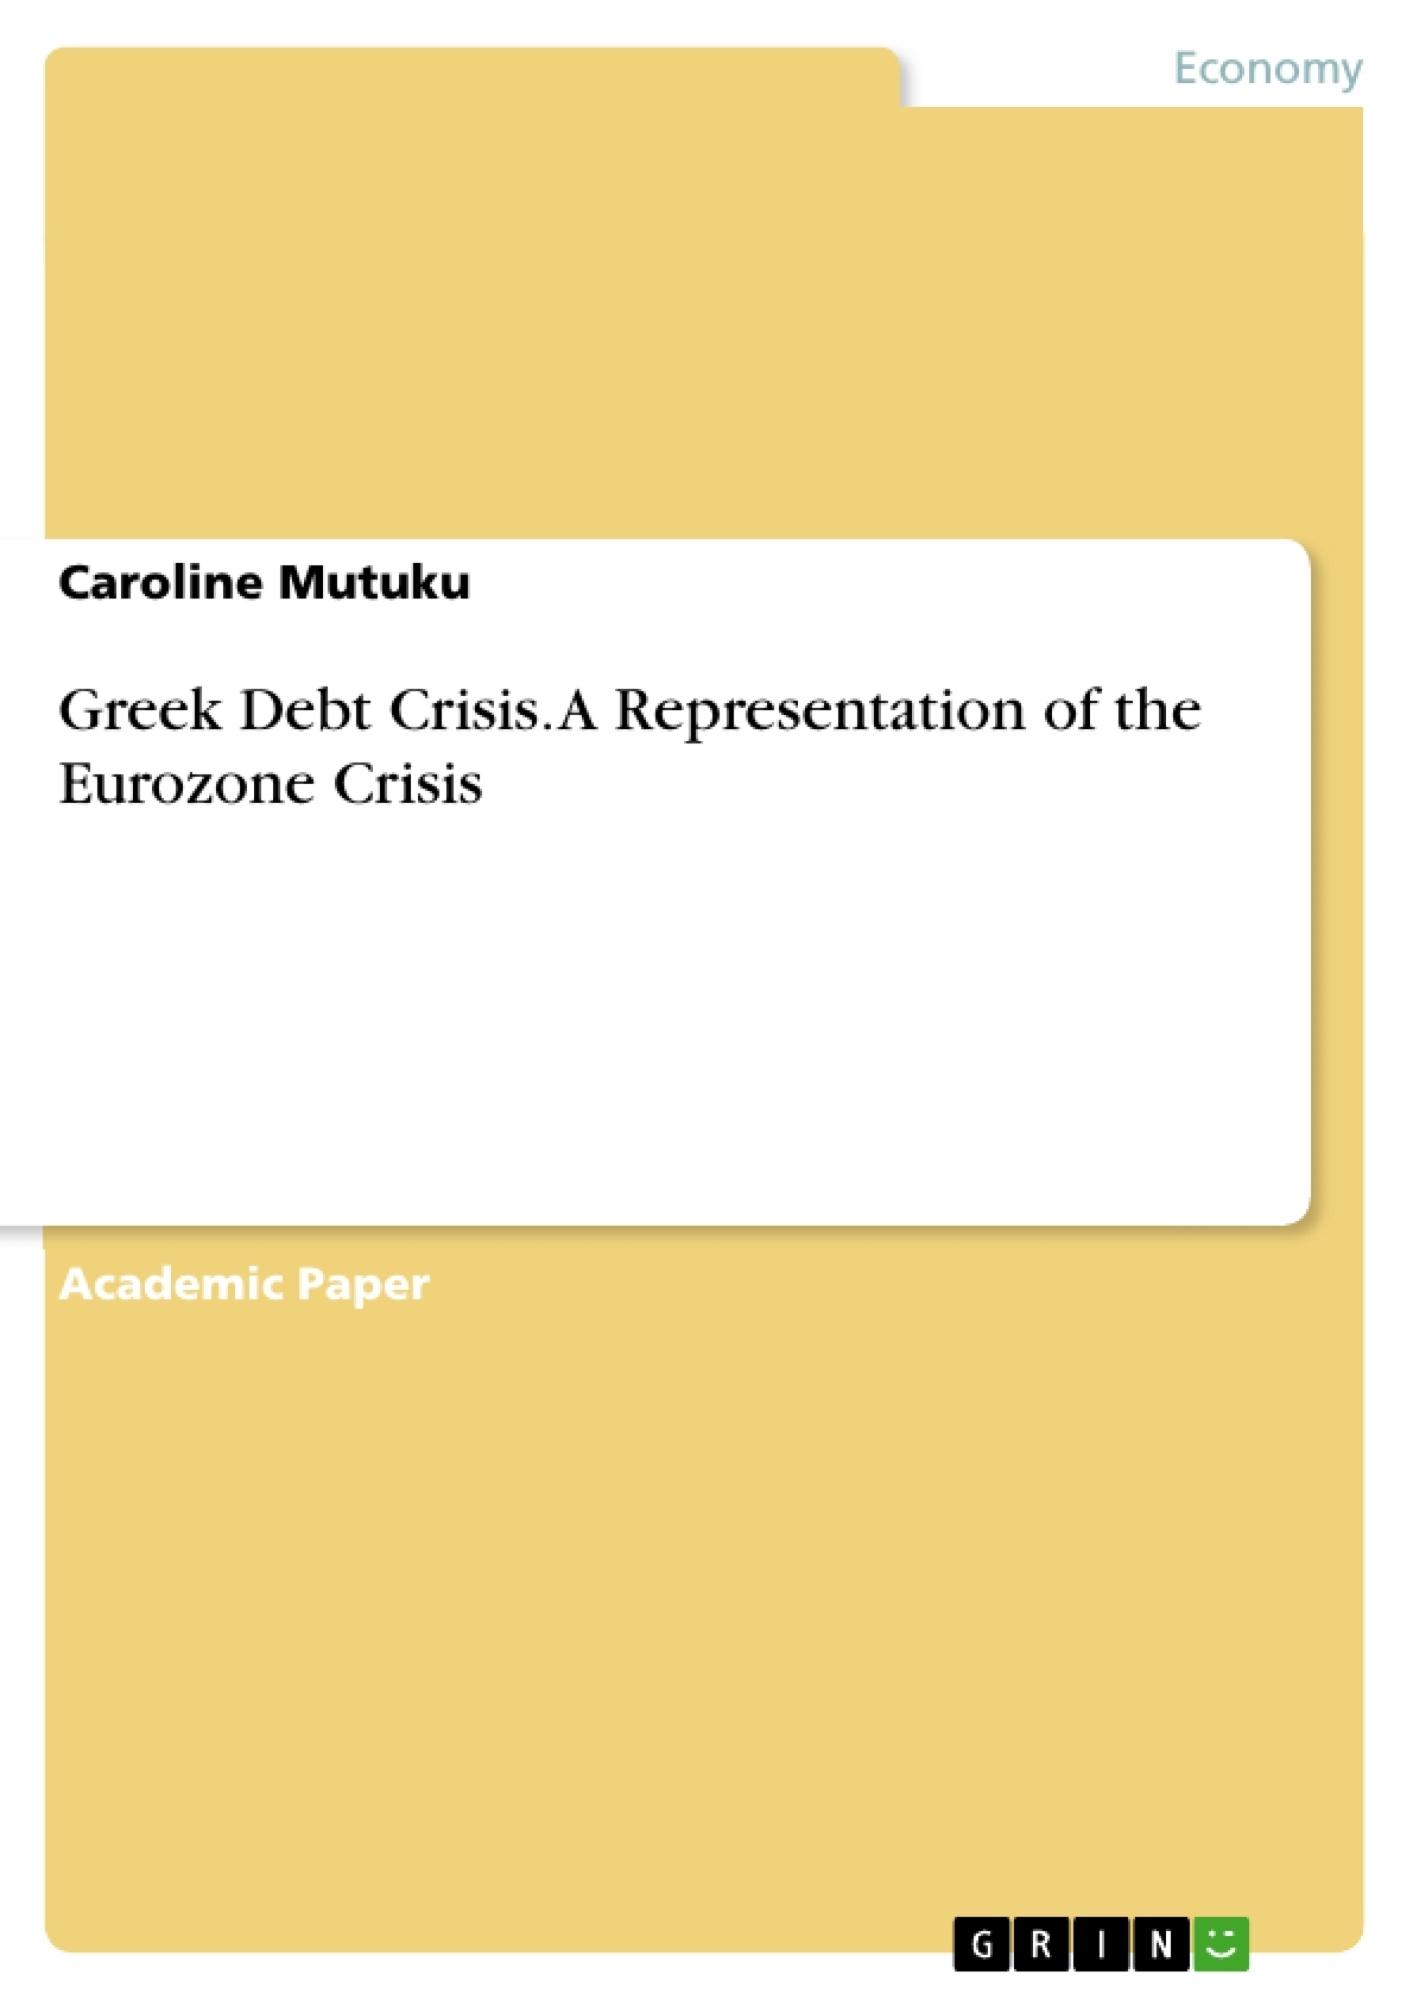 Title: Greek Debt Crisis. A Representation of the Eurozone Crisis